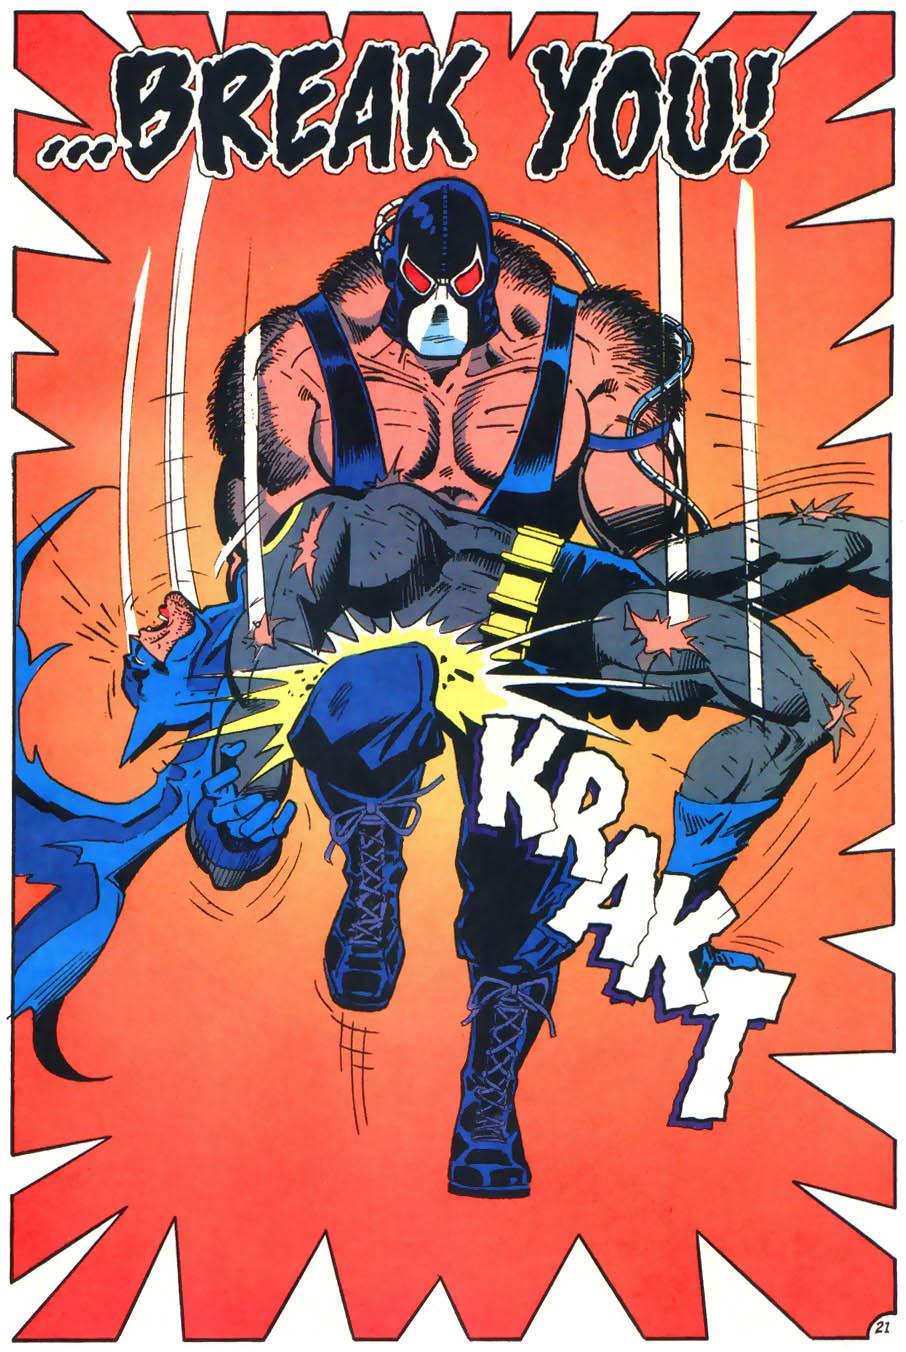 Rj1 cracking the superheroes moral code